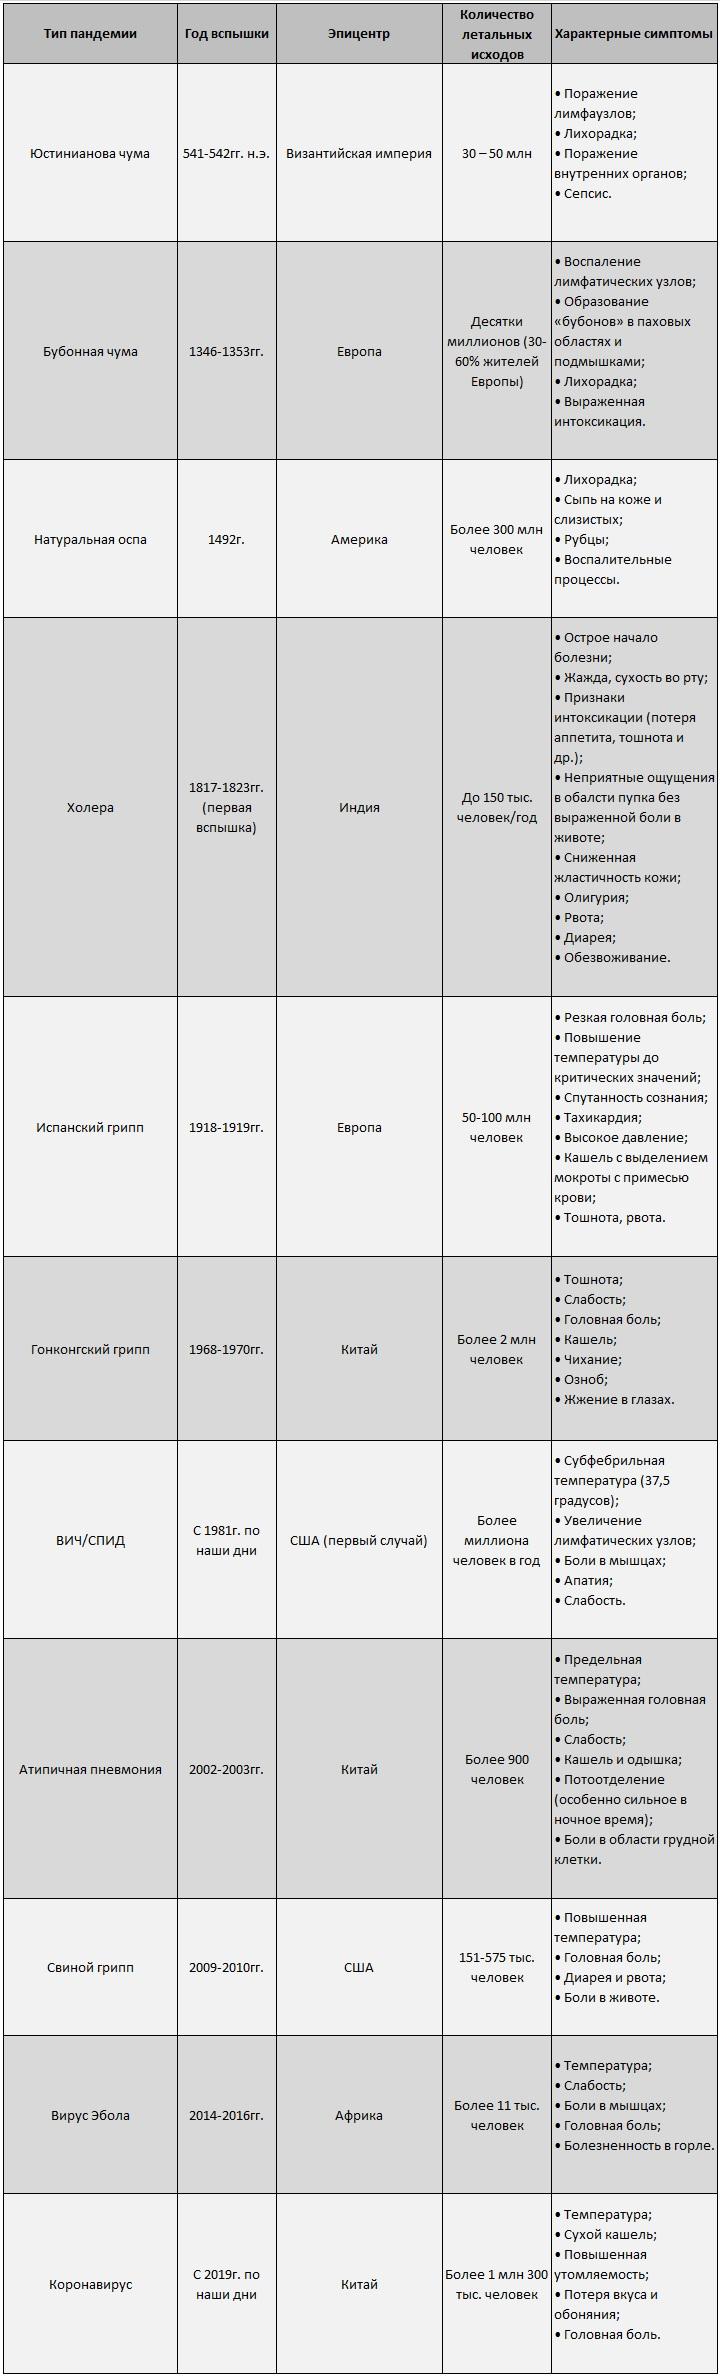 Пандемия таблица